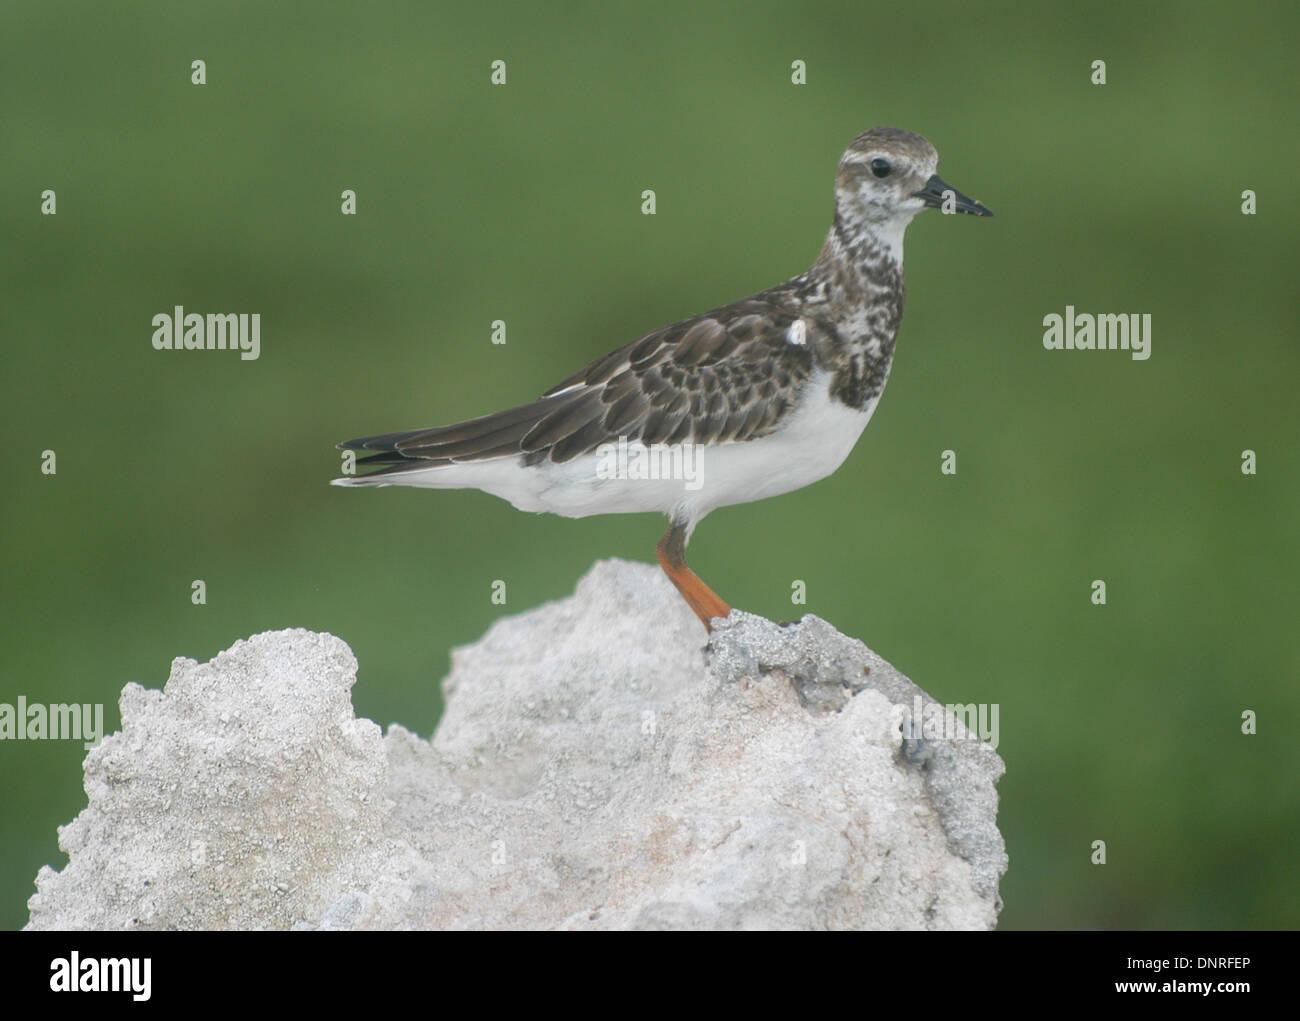 A seabird perches on a rock in Bird Island (Isla de Aves) a small island located in the Caribbean Sea, Venezuela - Stock Image